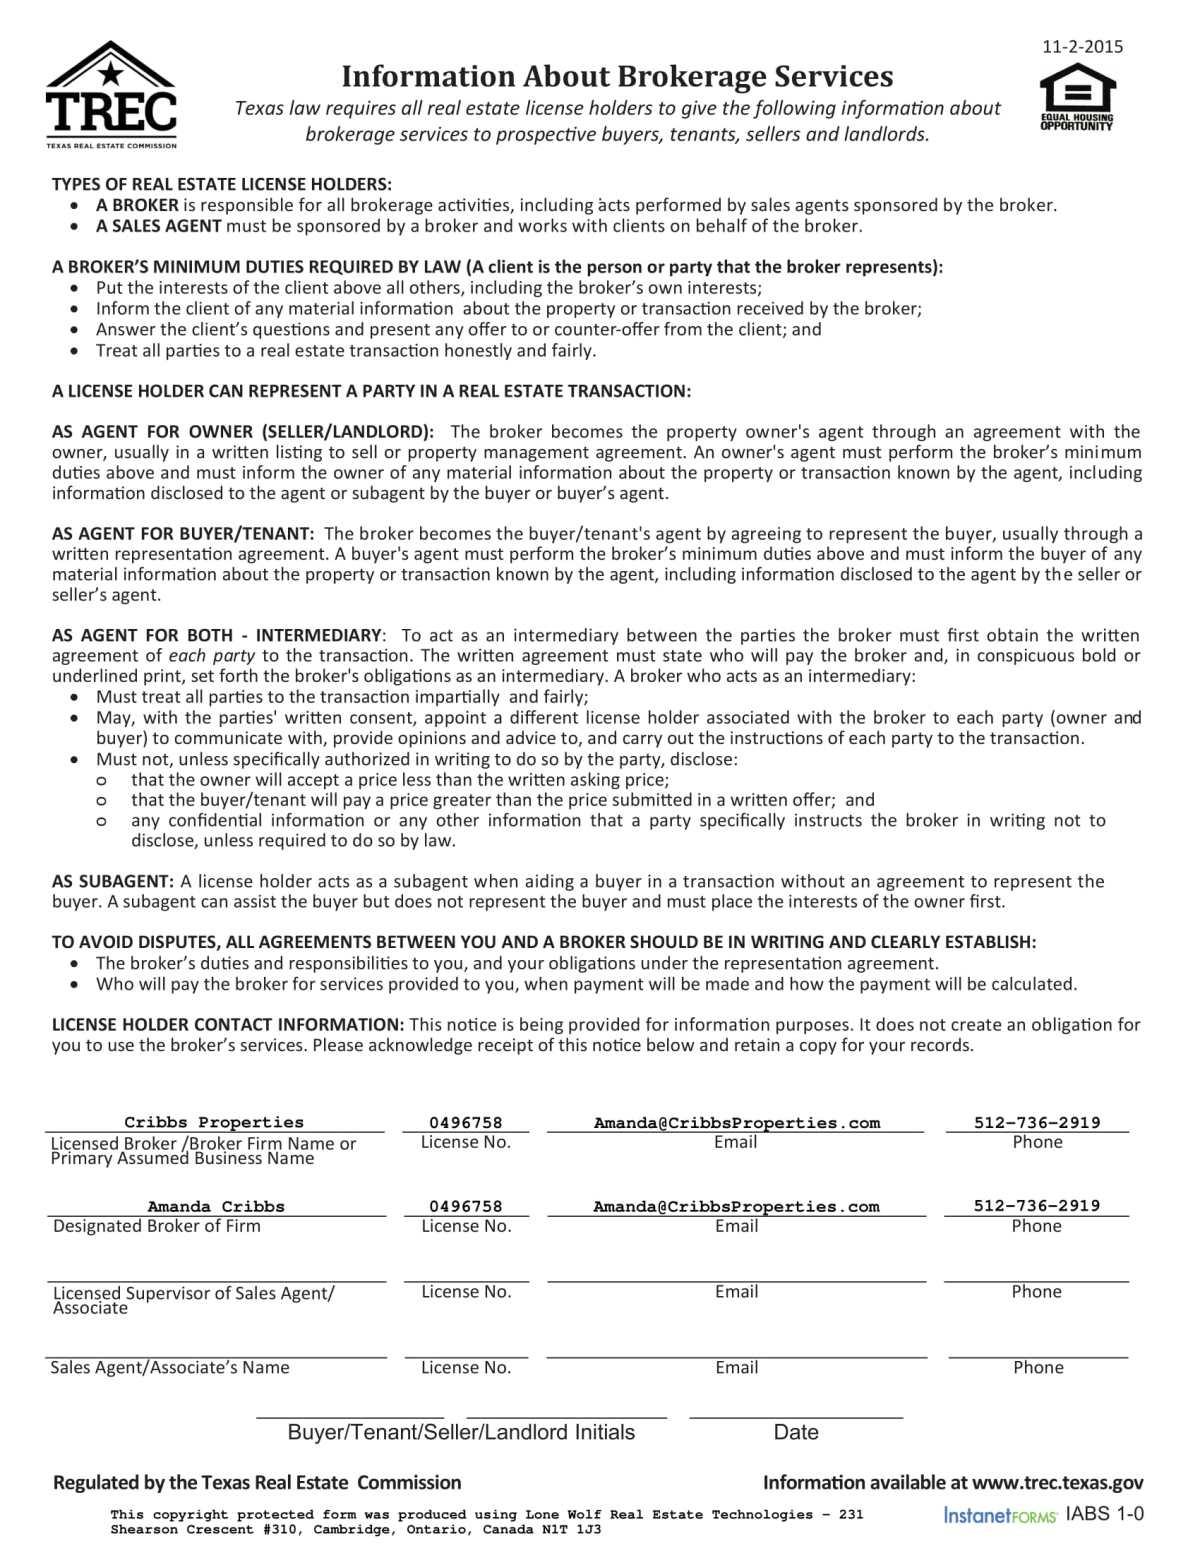 Information About Brokerage Services (TREC No. OP-K) (1)-1